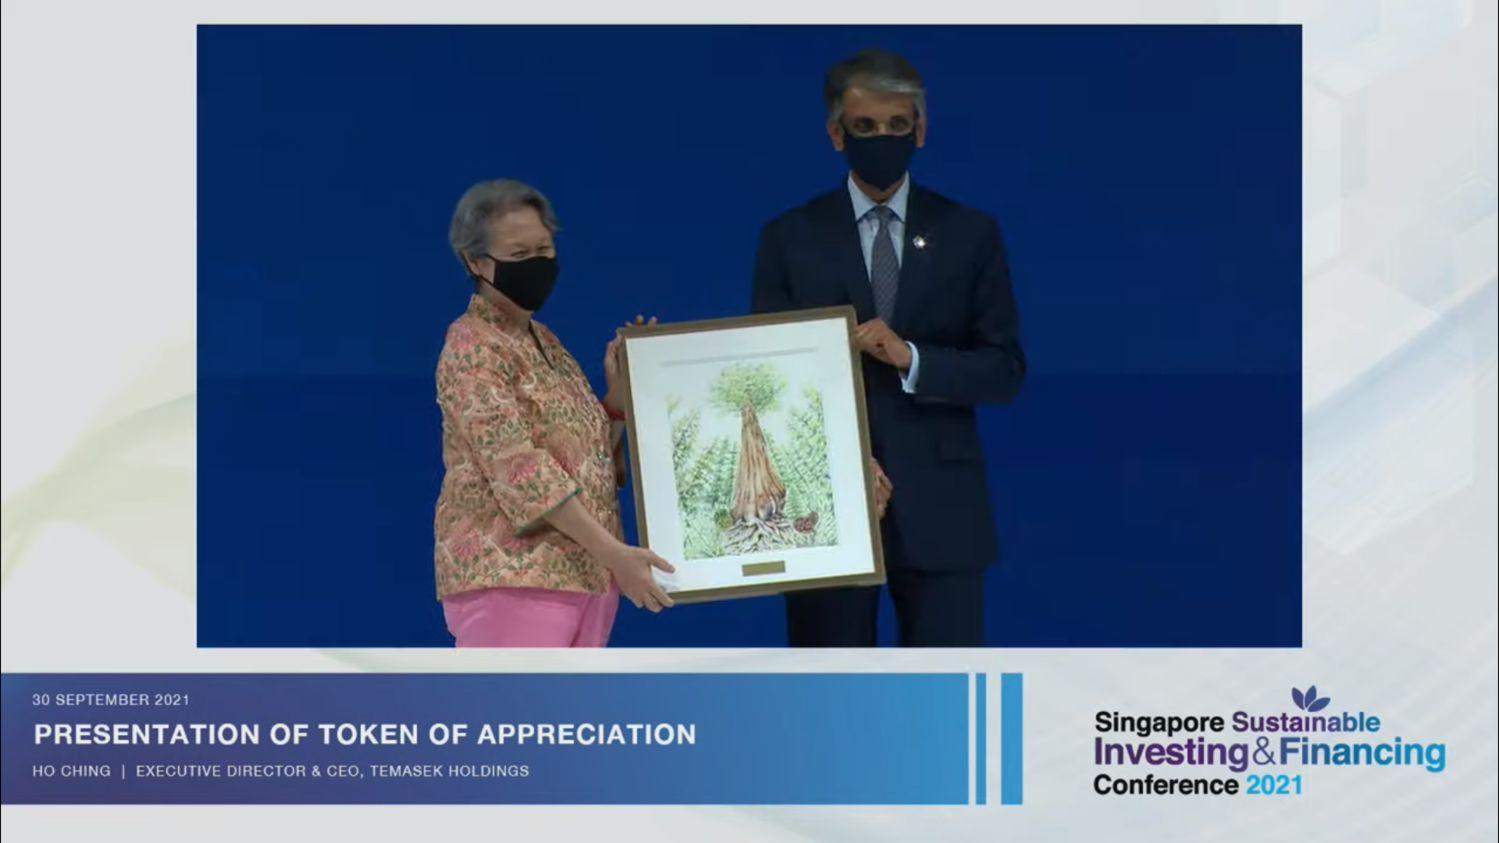 presentation of token of appreciation - THE EDGE SINGAPORE